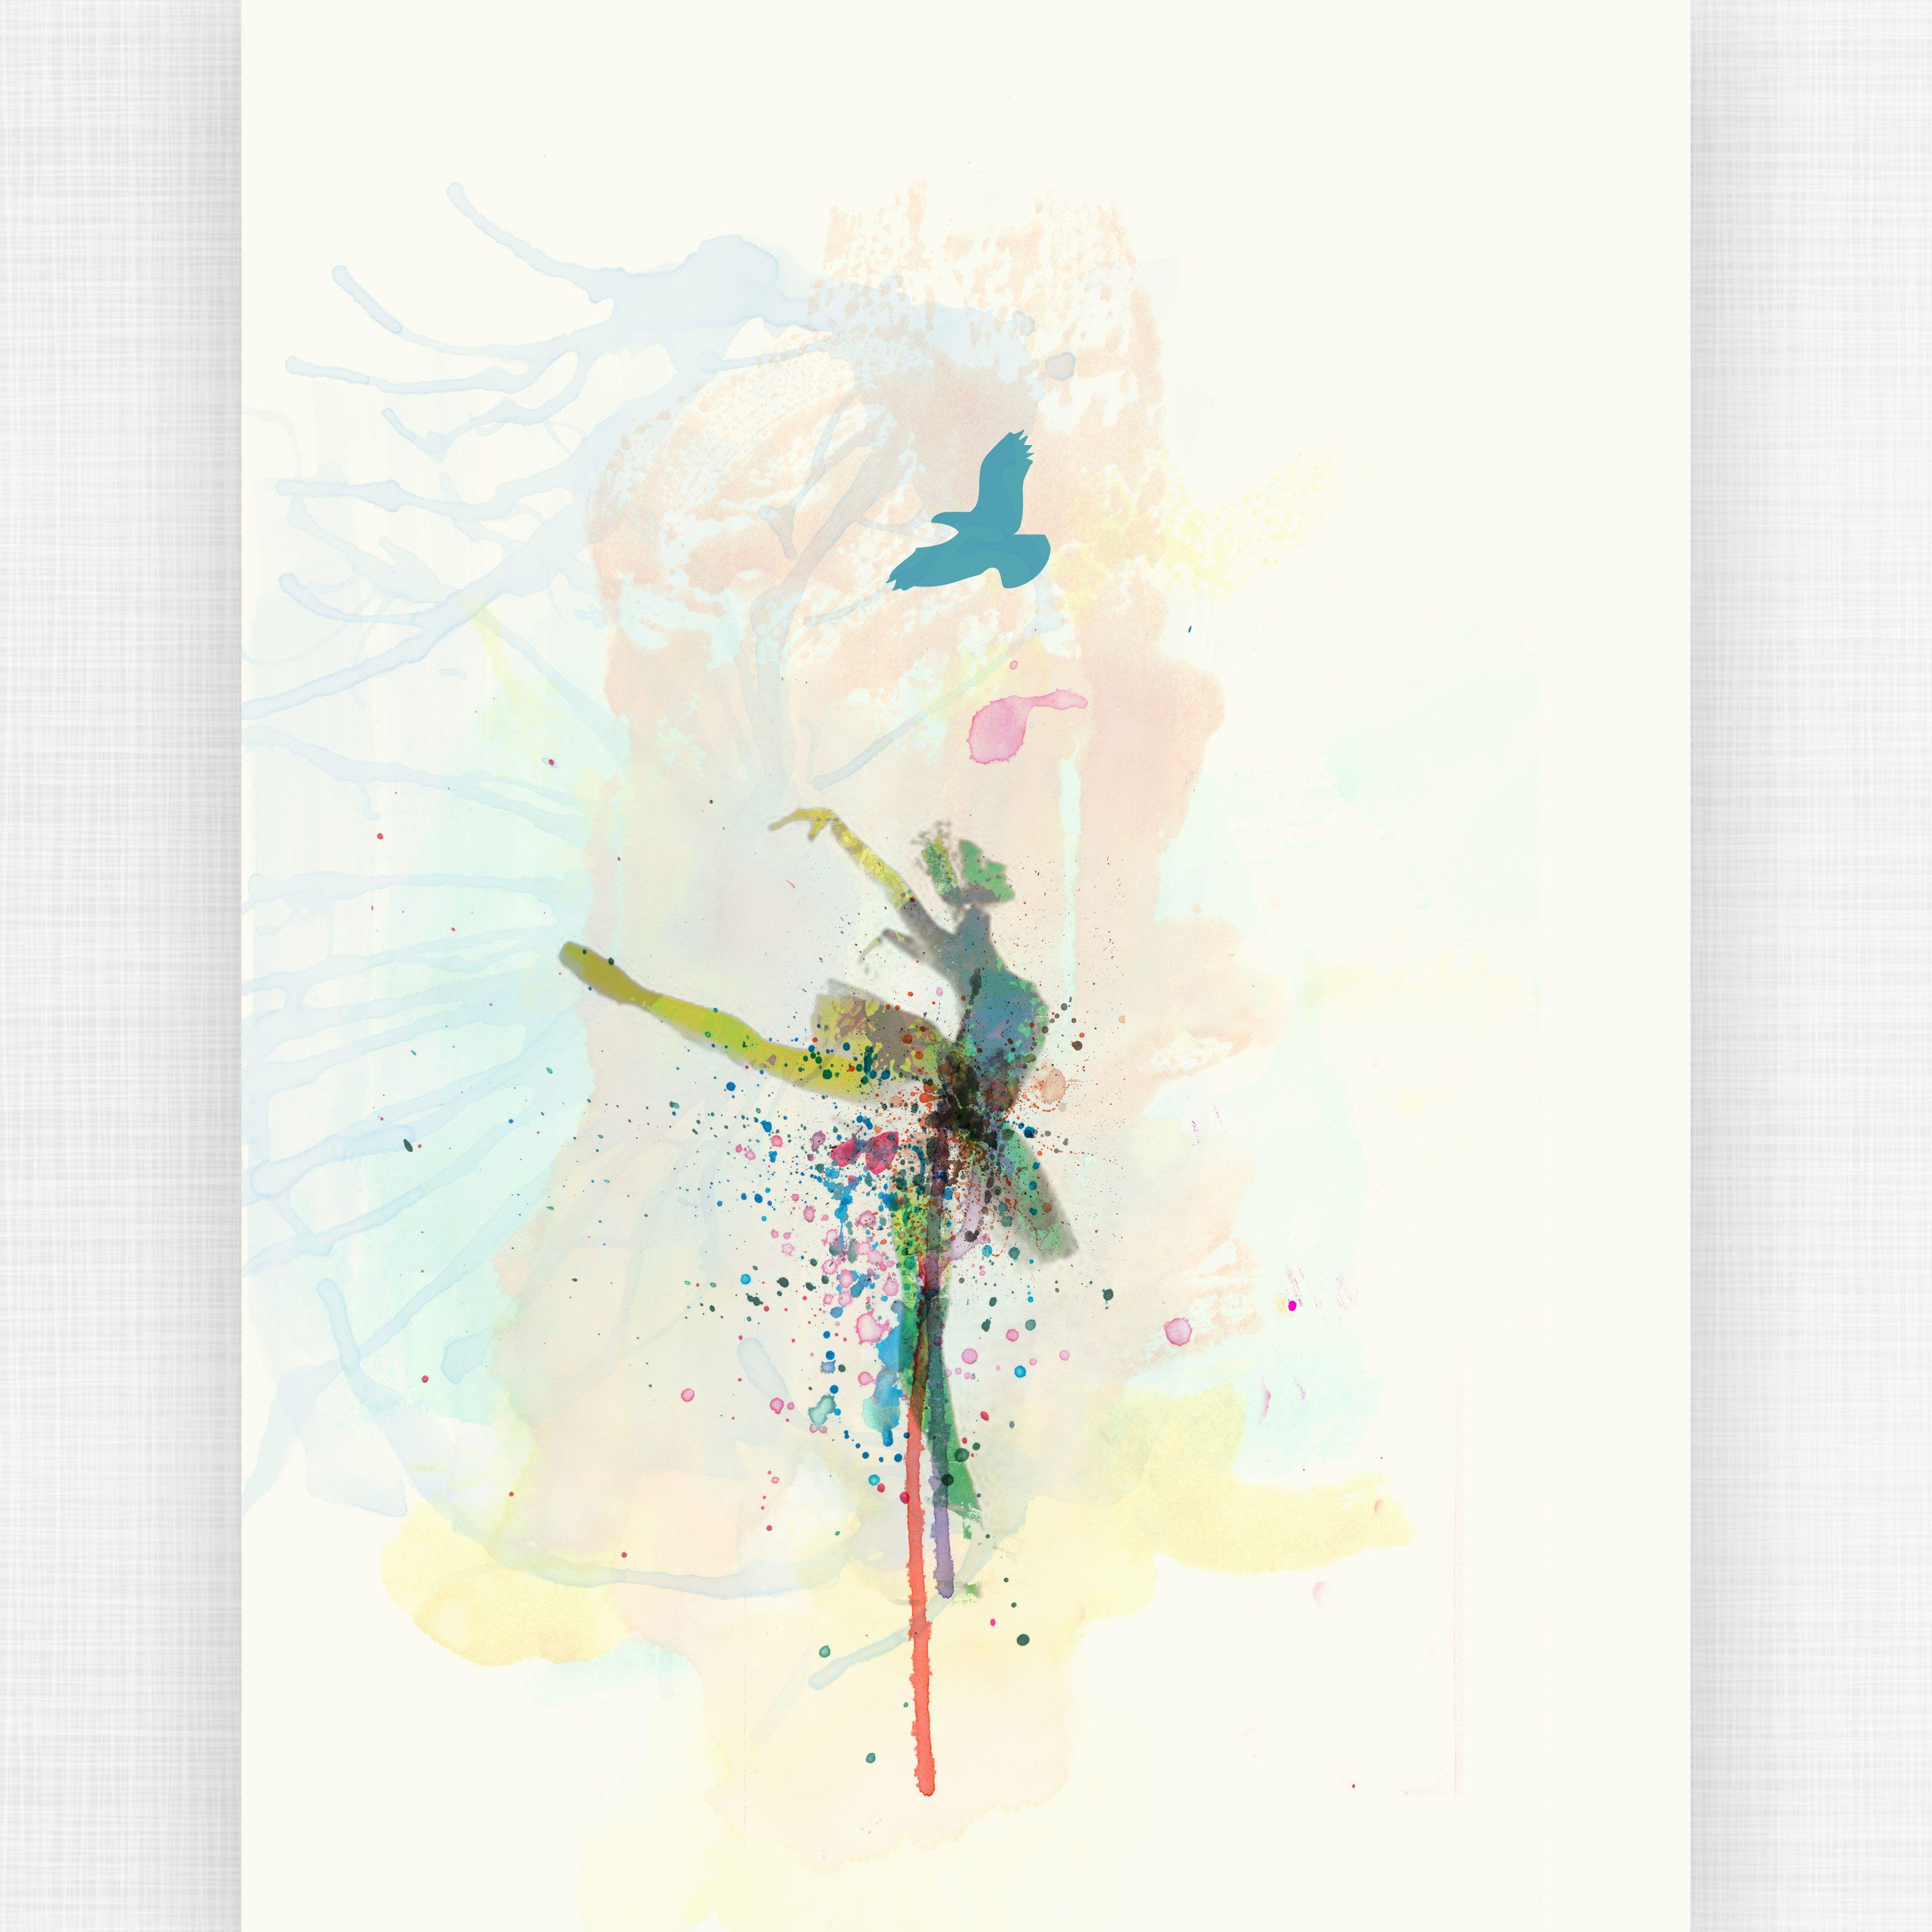 Ballerina 18x24 Print